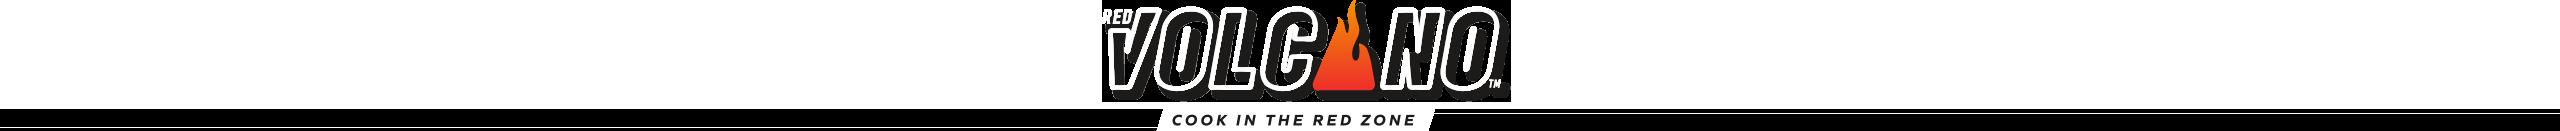 red volcano logo